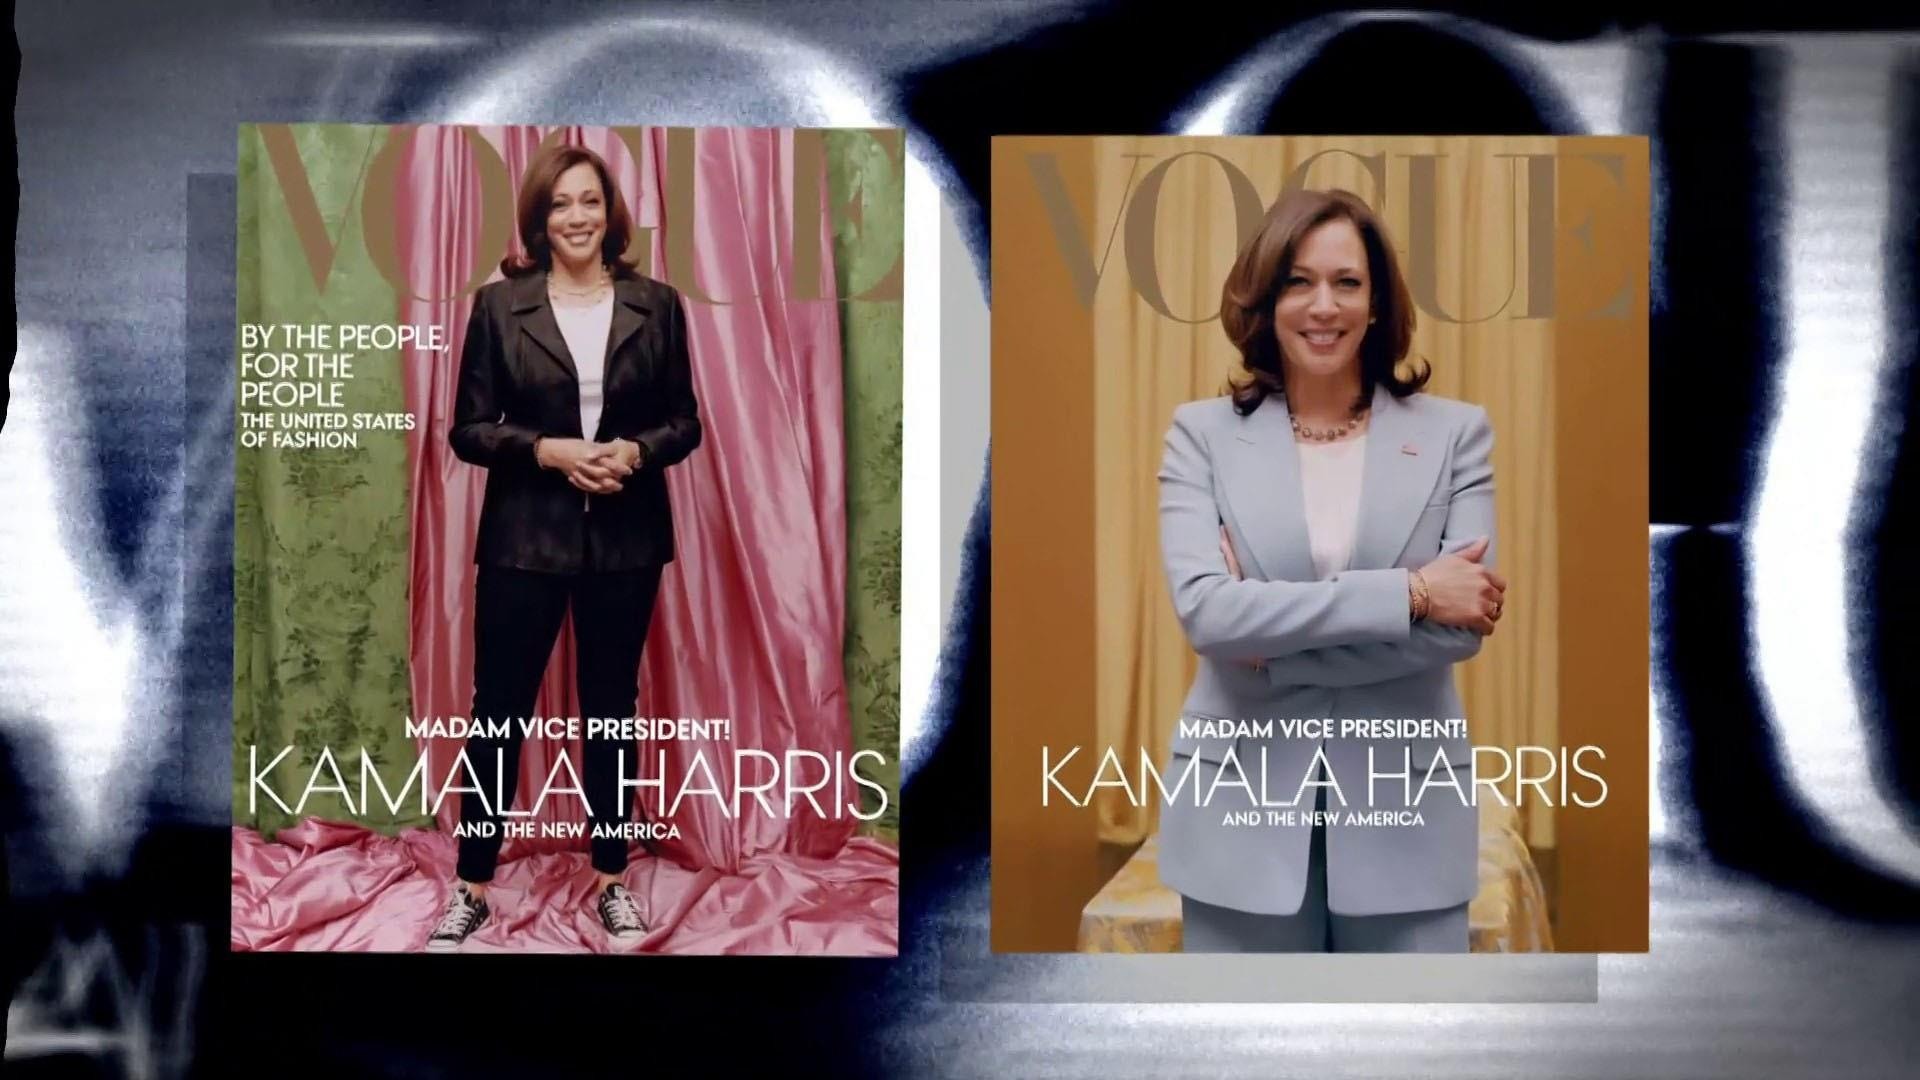 Vogue Kamala Harris